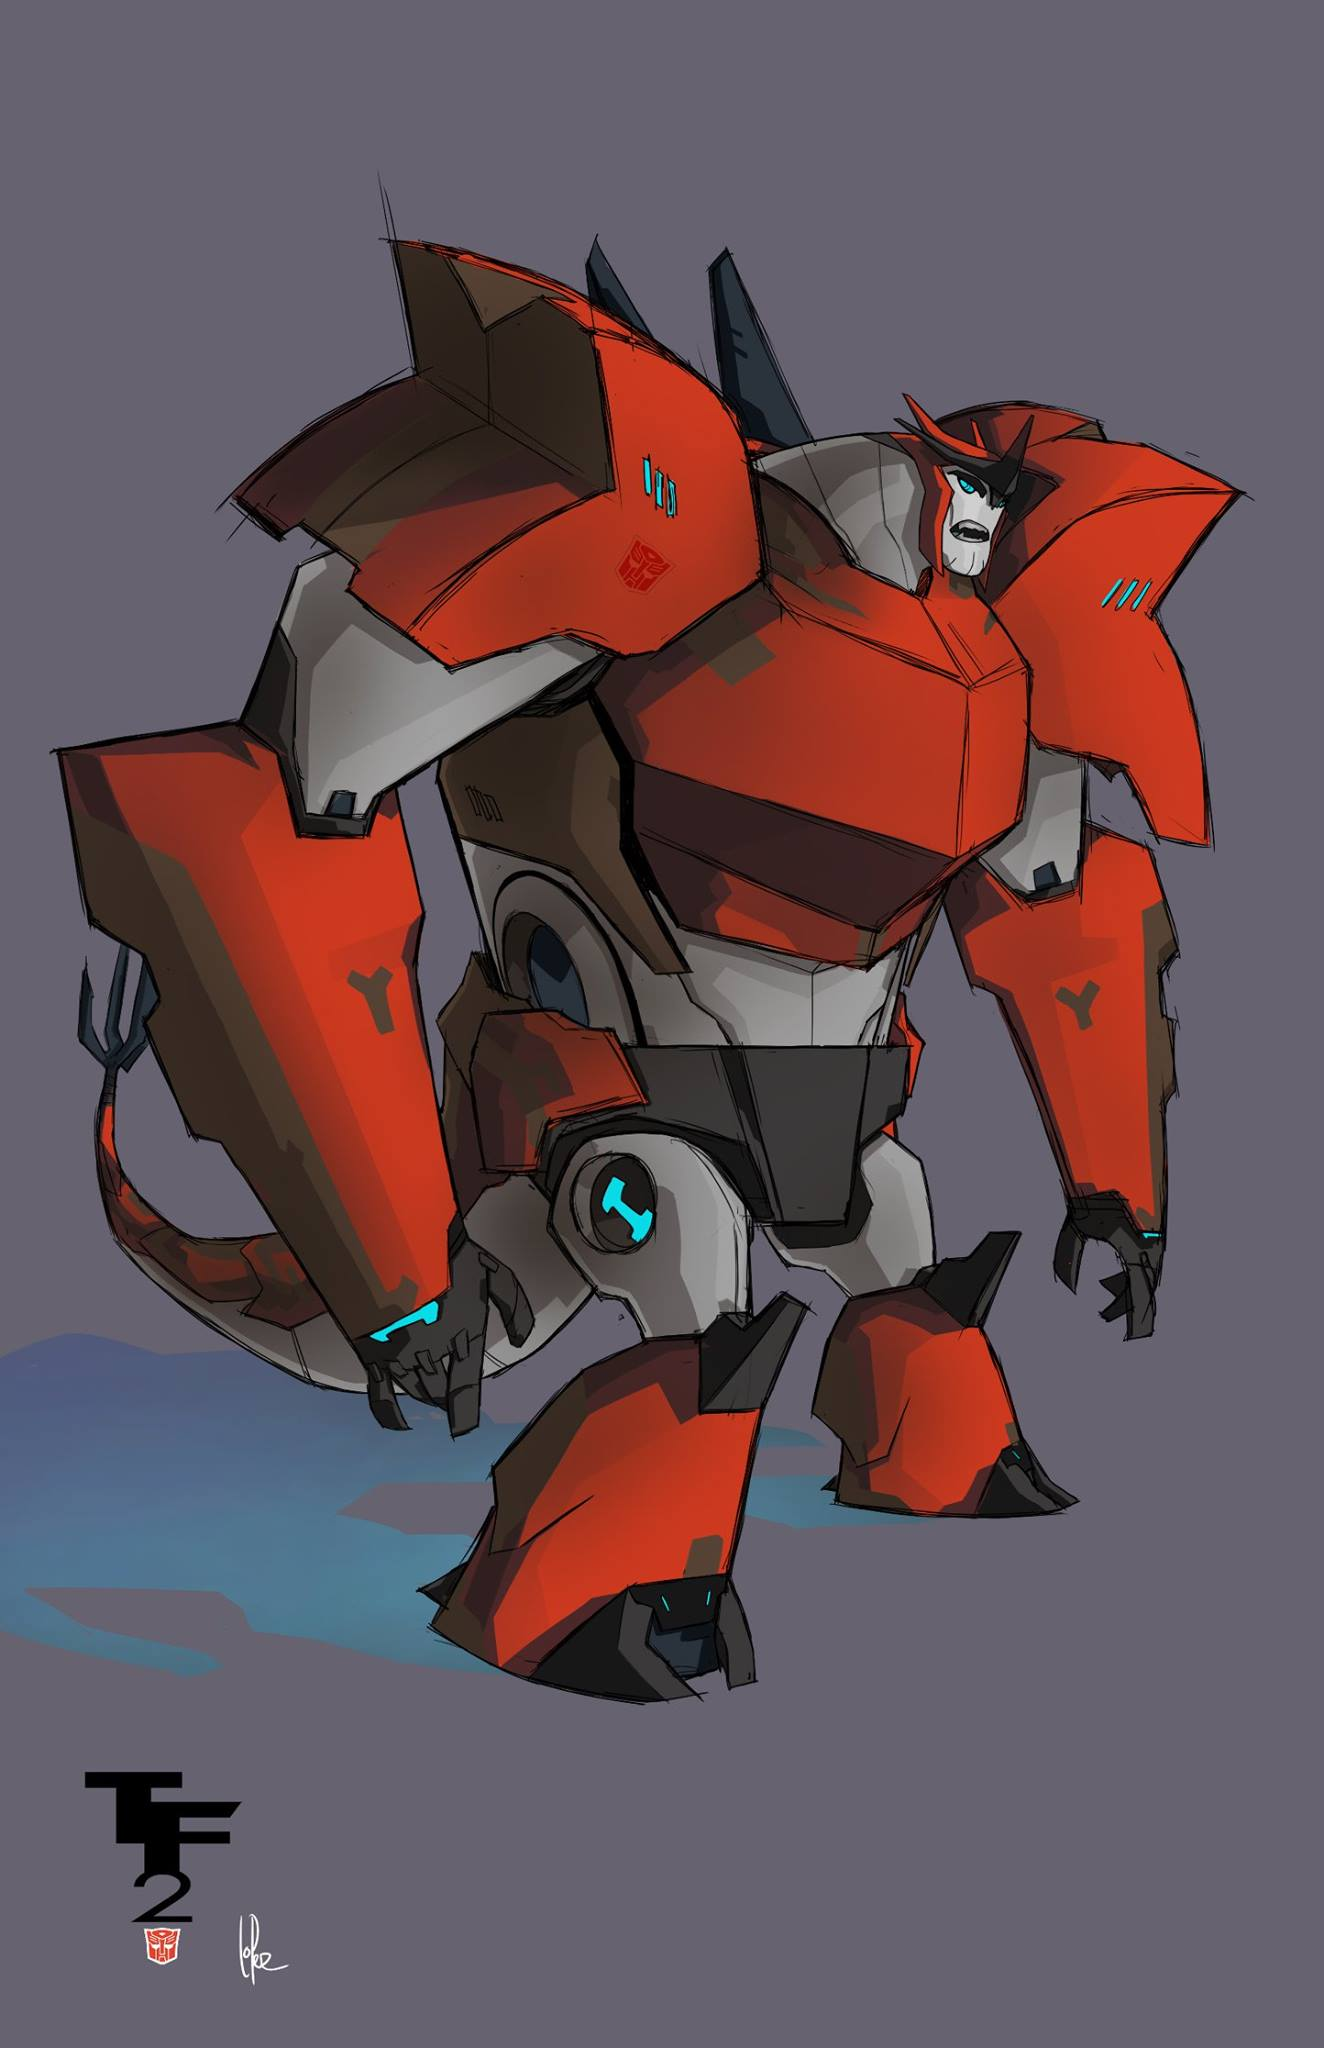 Transformers Robots In Disguise Grimlock Concept Art